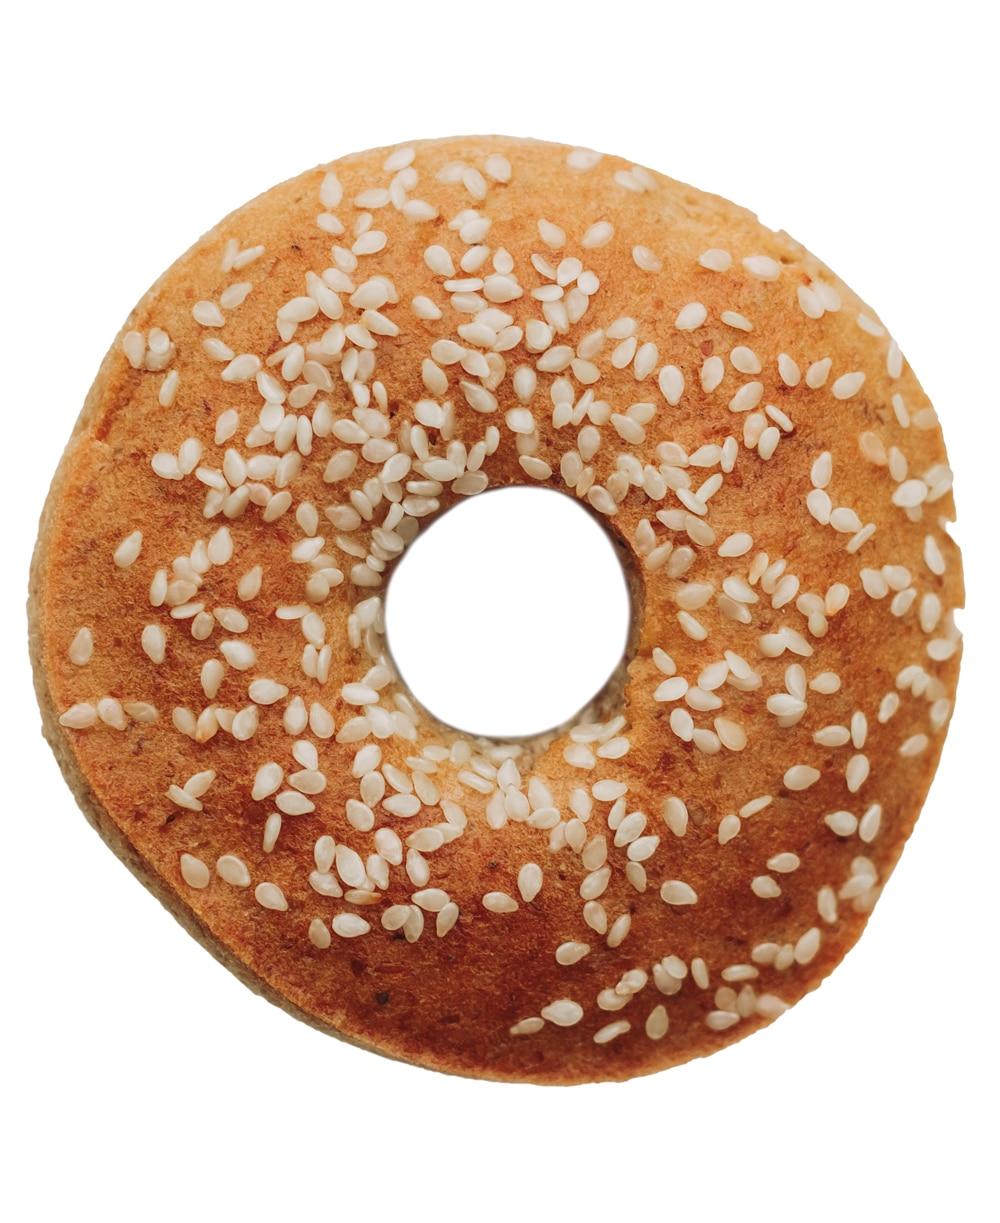 Nina's Sesame Paleo Bagels